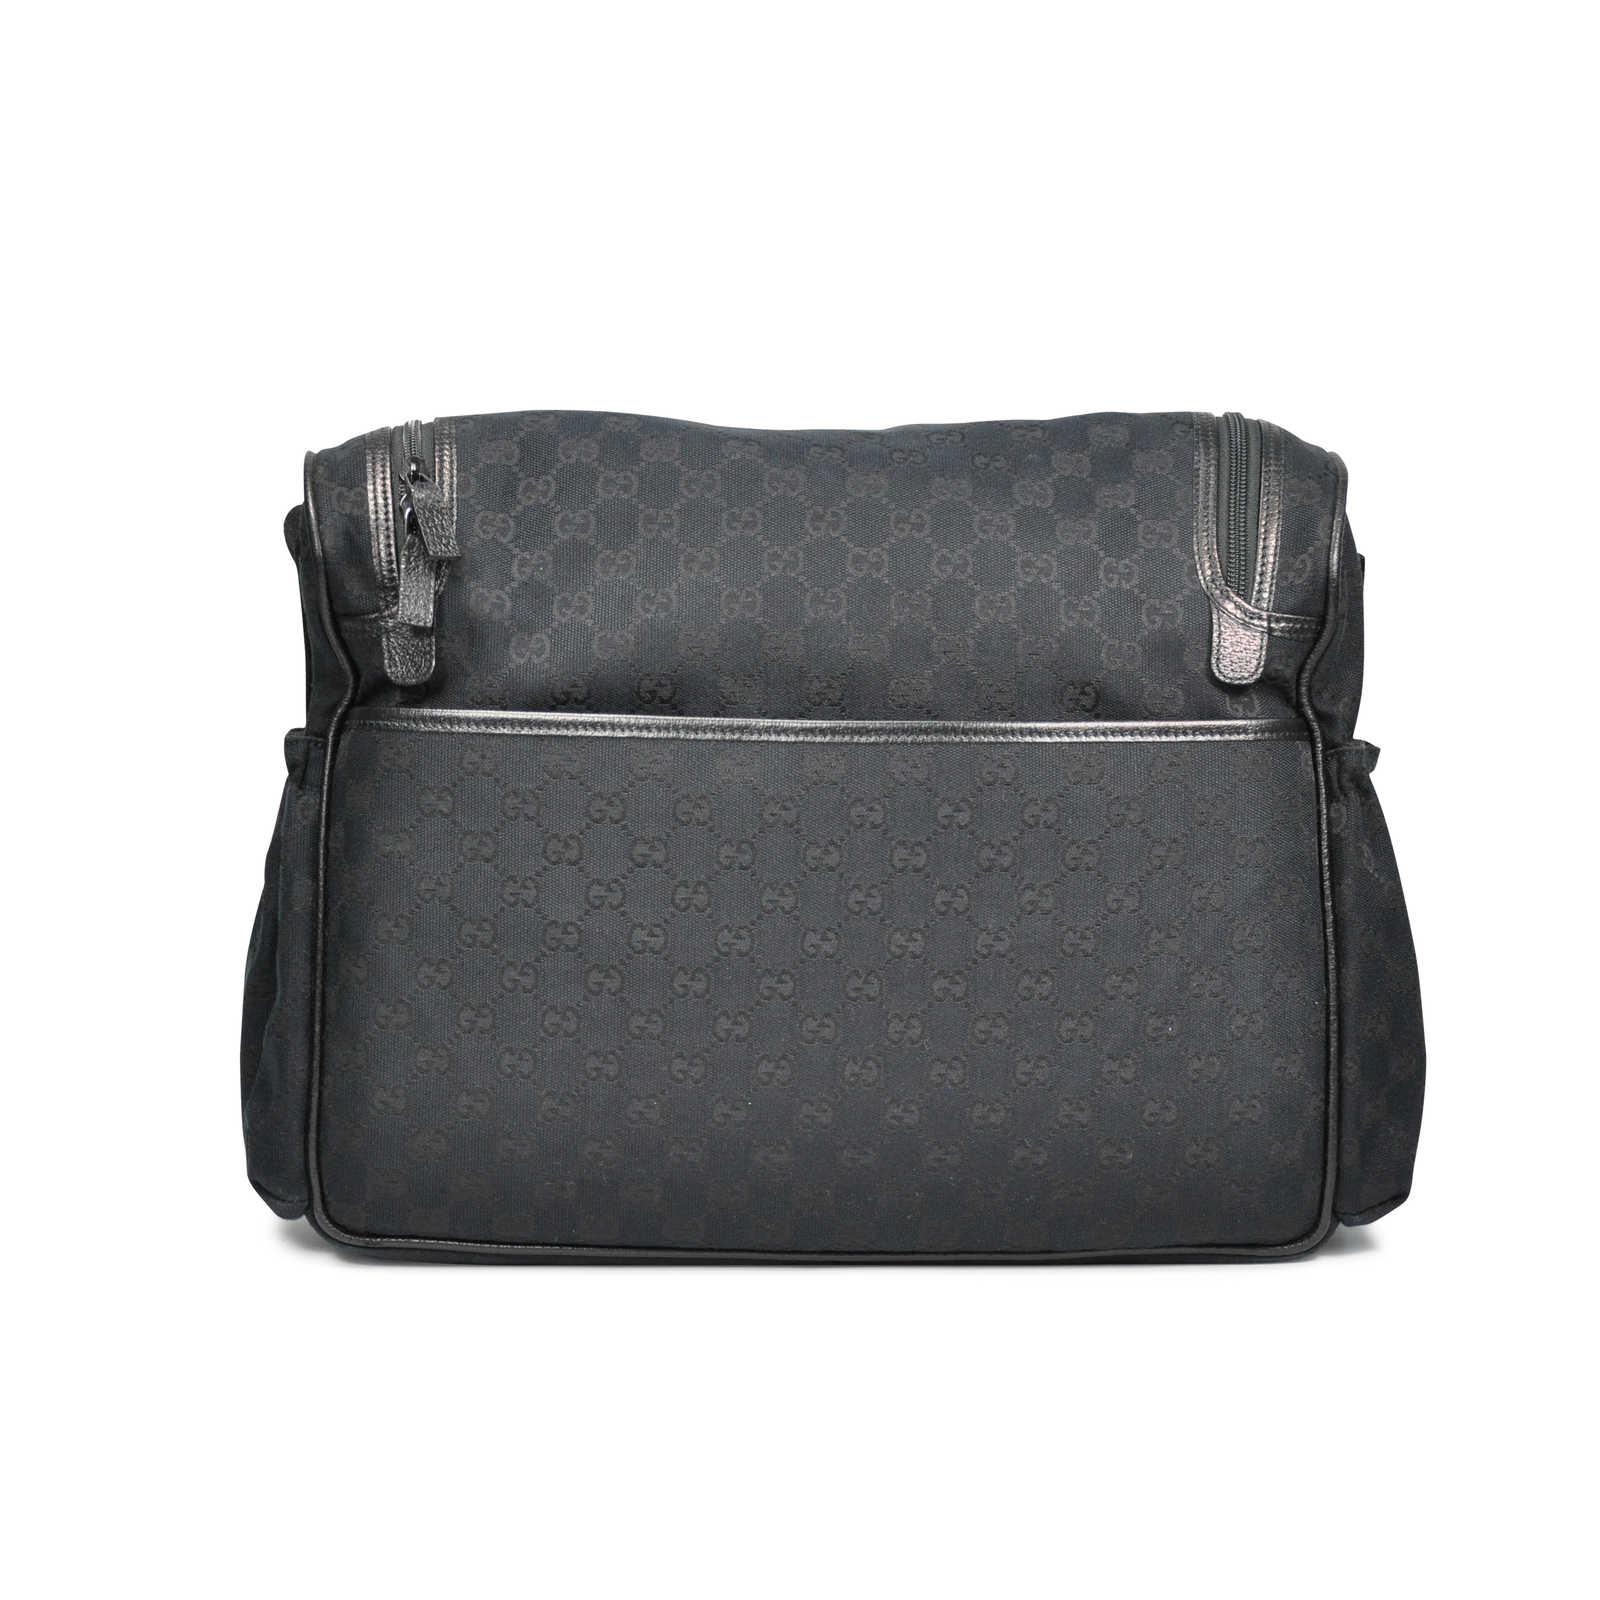 df179b23dfc13 ... Authentic Second Hand Gucci Diaper Bag (PSS-133-00008) - Thumbnail 1 ...